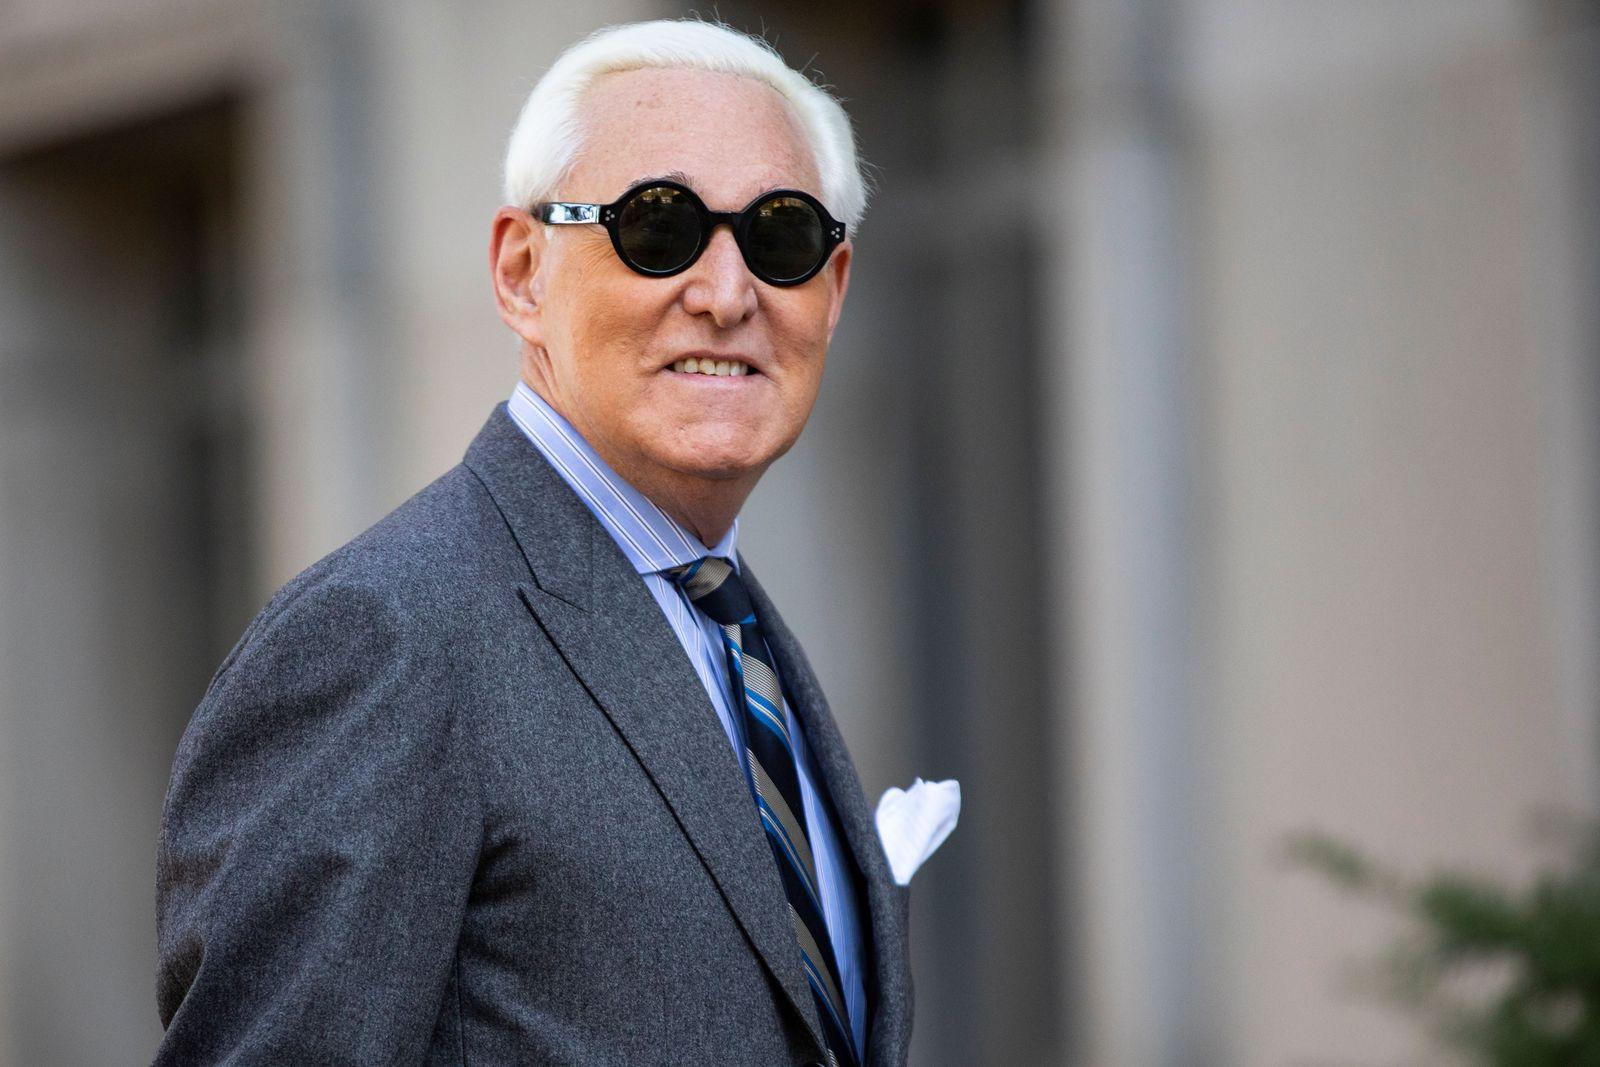 Trump commutes sentence of former advisor Roger Stone, Washington, USA - 13 Nov 2019